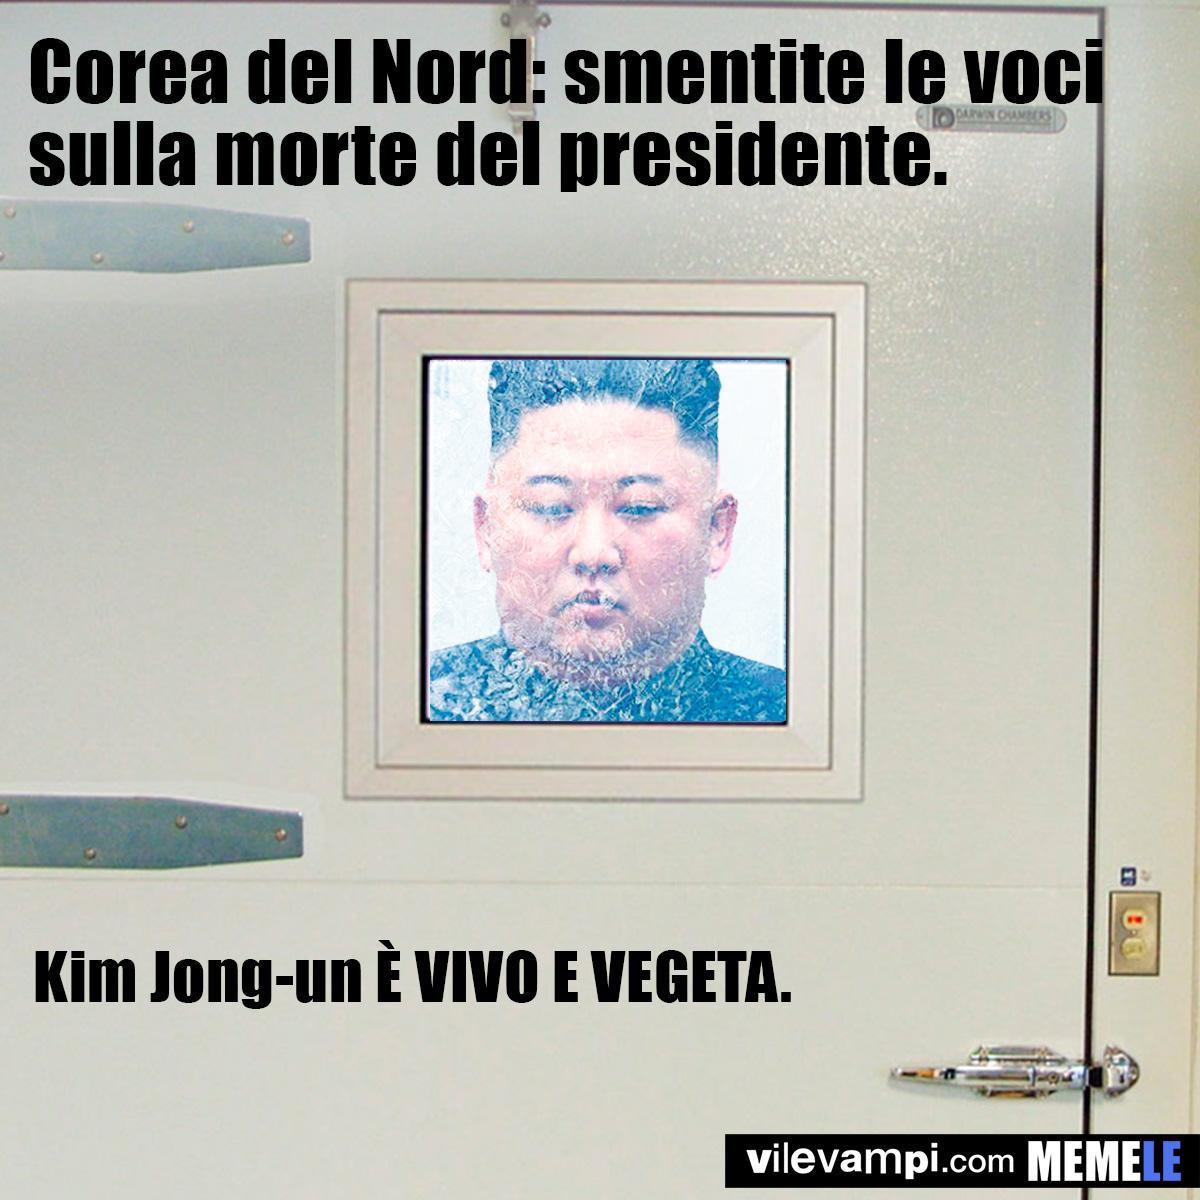 2020_Meme-Kim-Jong-un